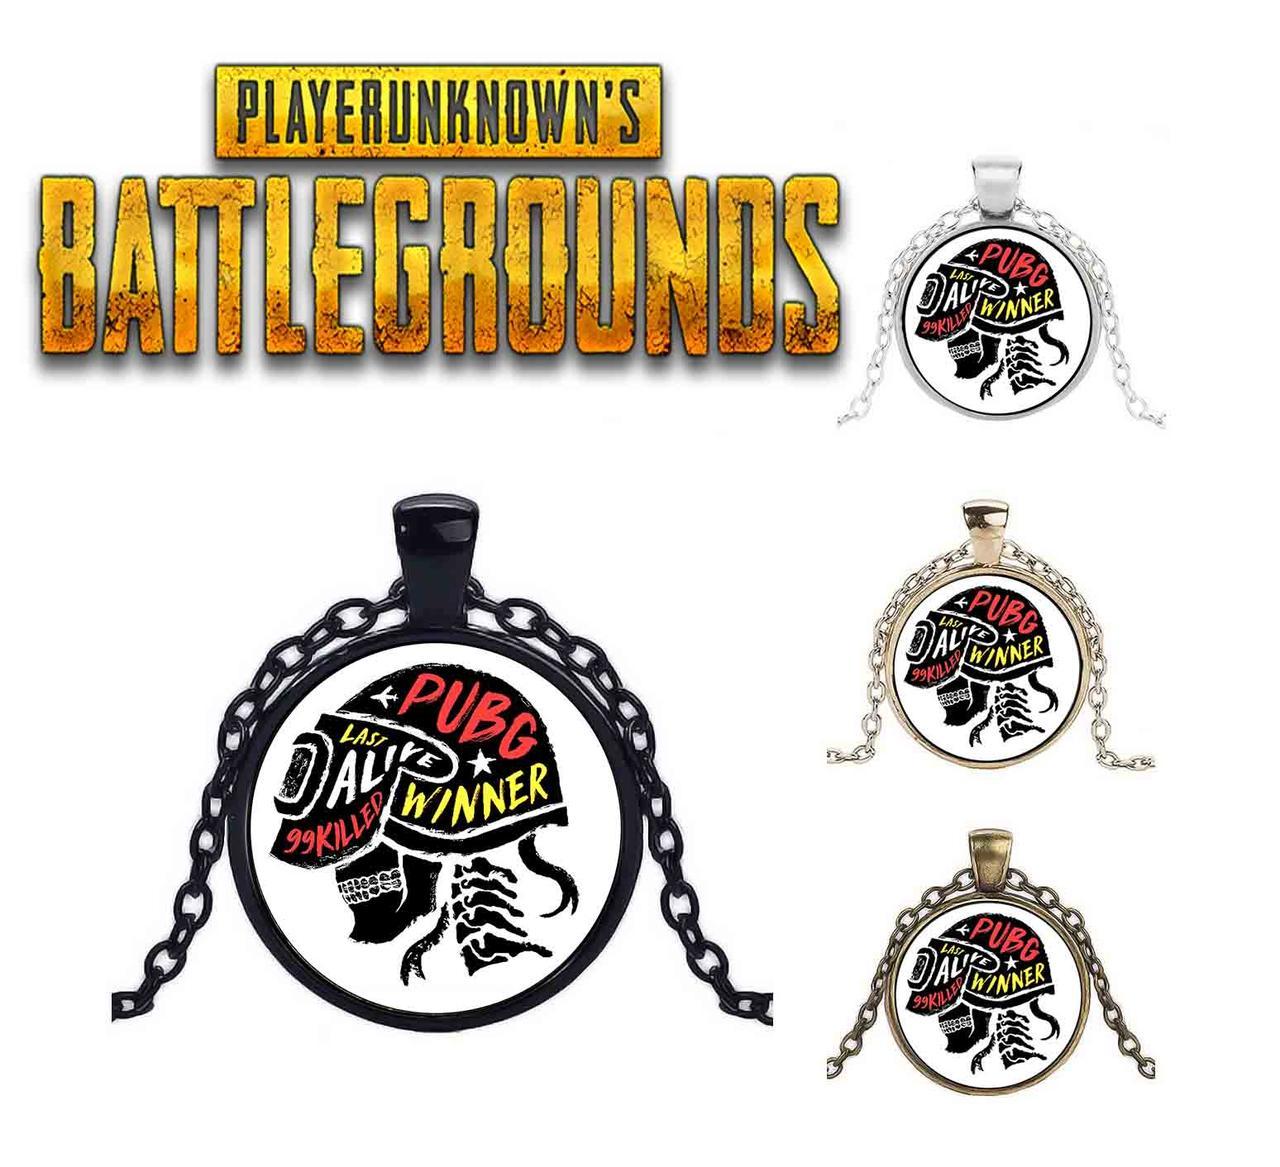 Кулон с надписями и символикой PlayerUnknown's Battlegrounds PUBG